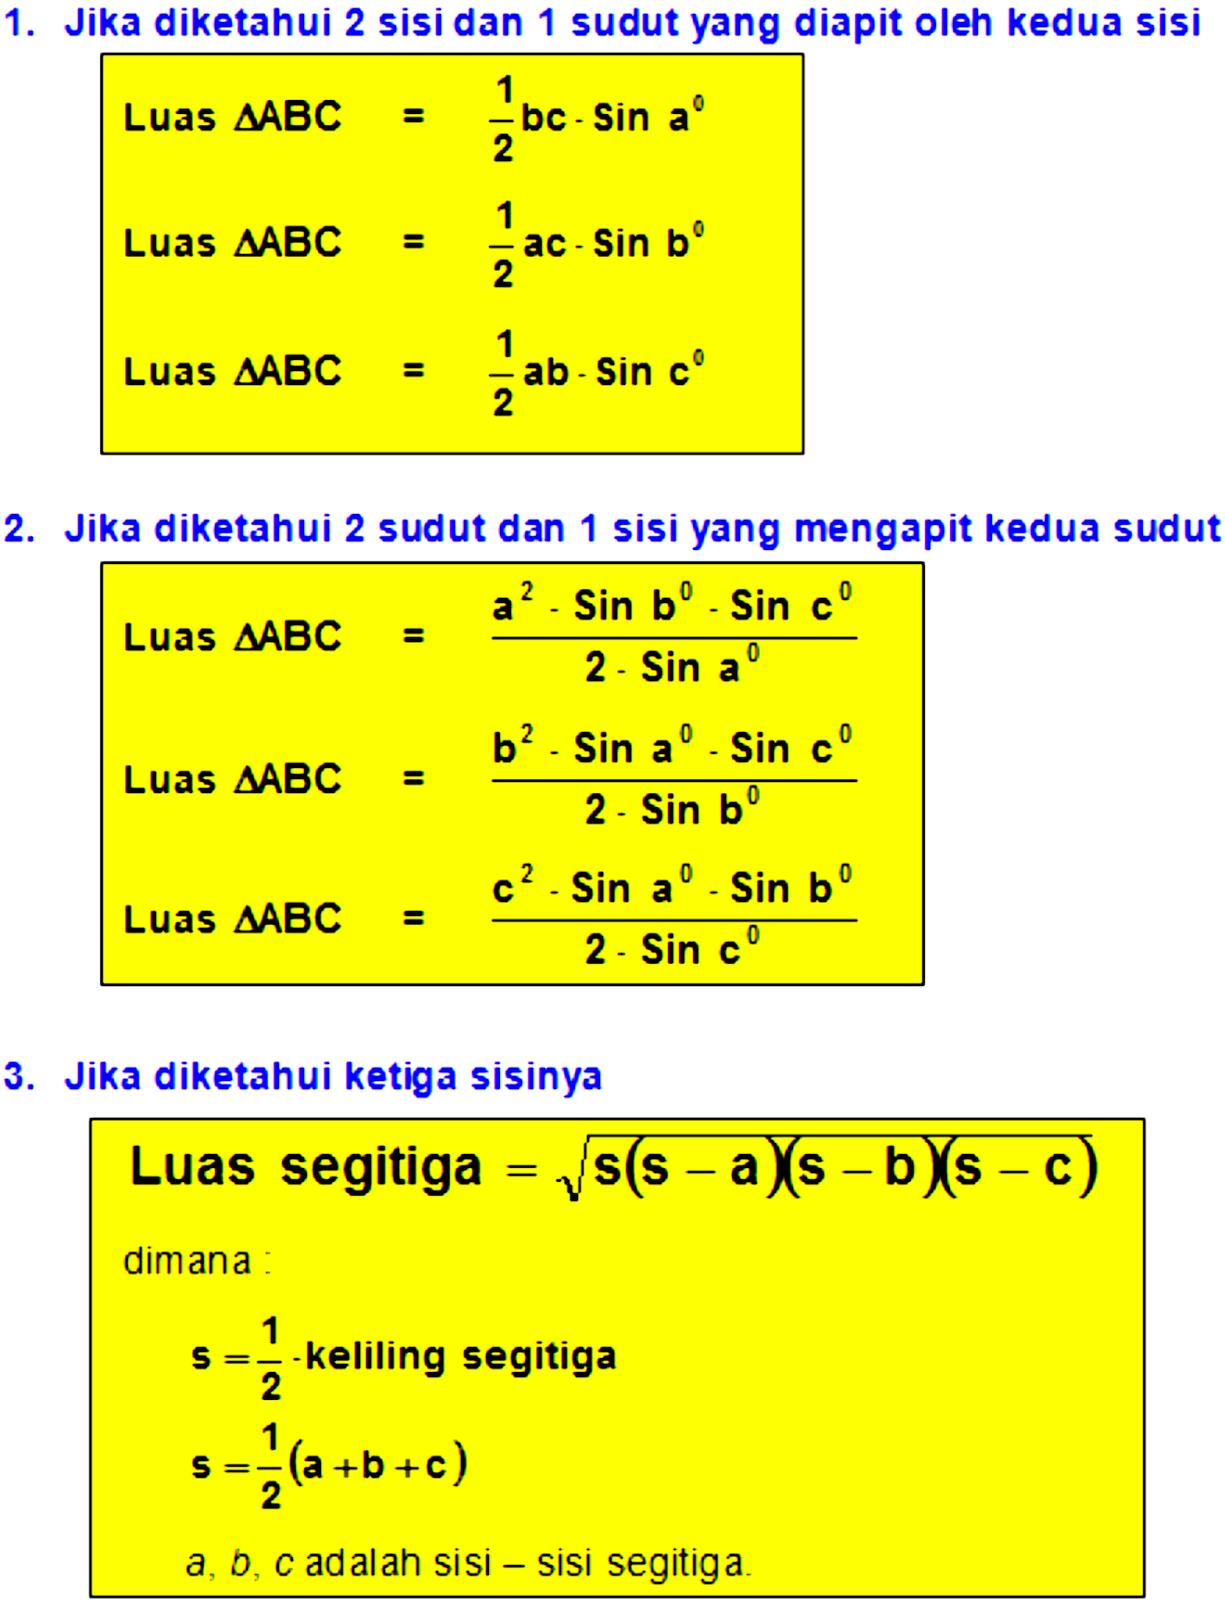 Luas Segitiga Trigonometri : segitiga, trigonometri, Segitiga, Trigonometri